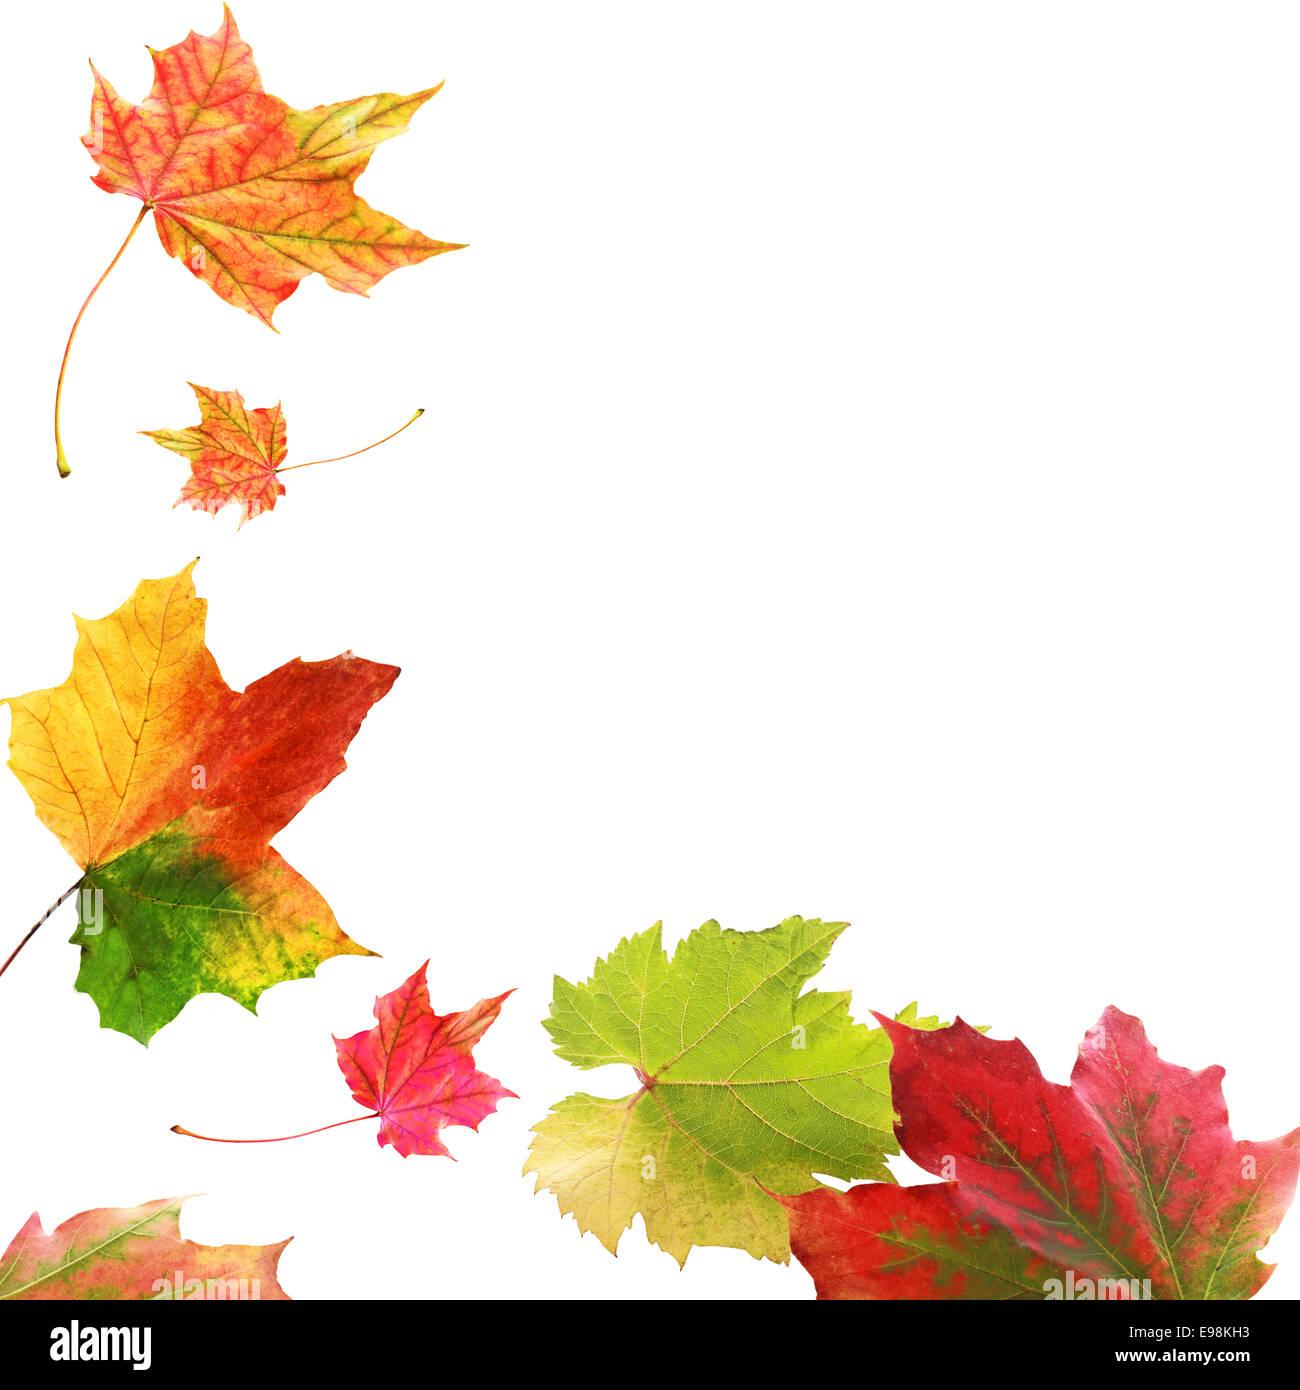 Corner border of colorful vivid variegated autumn or fall ...